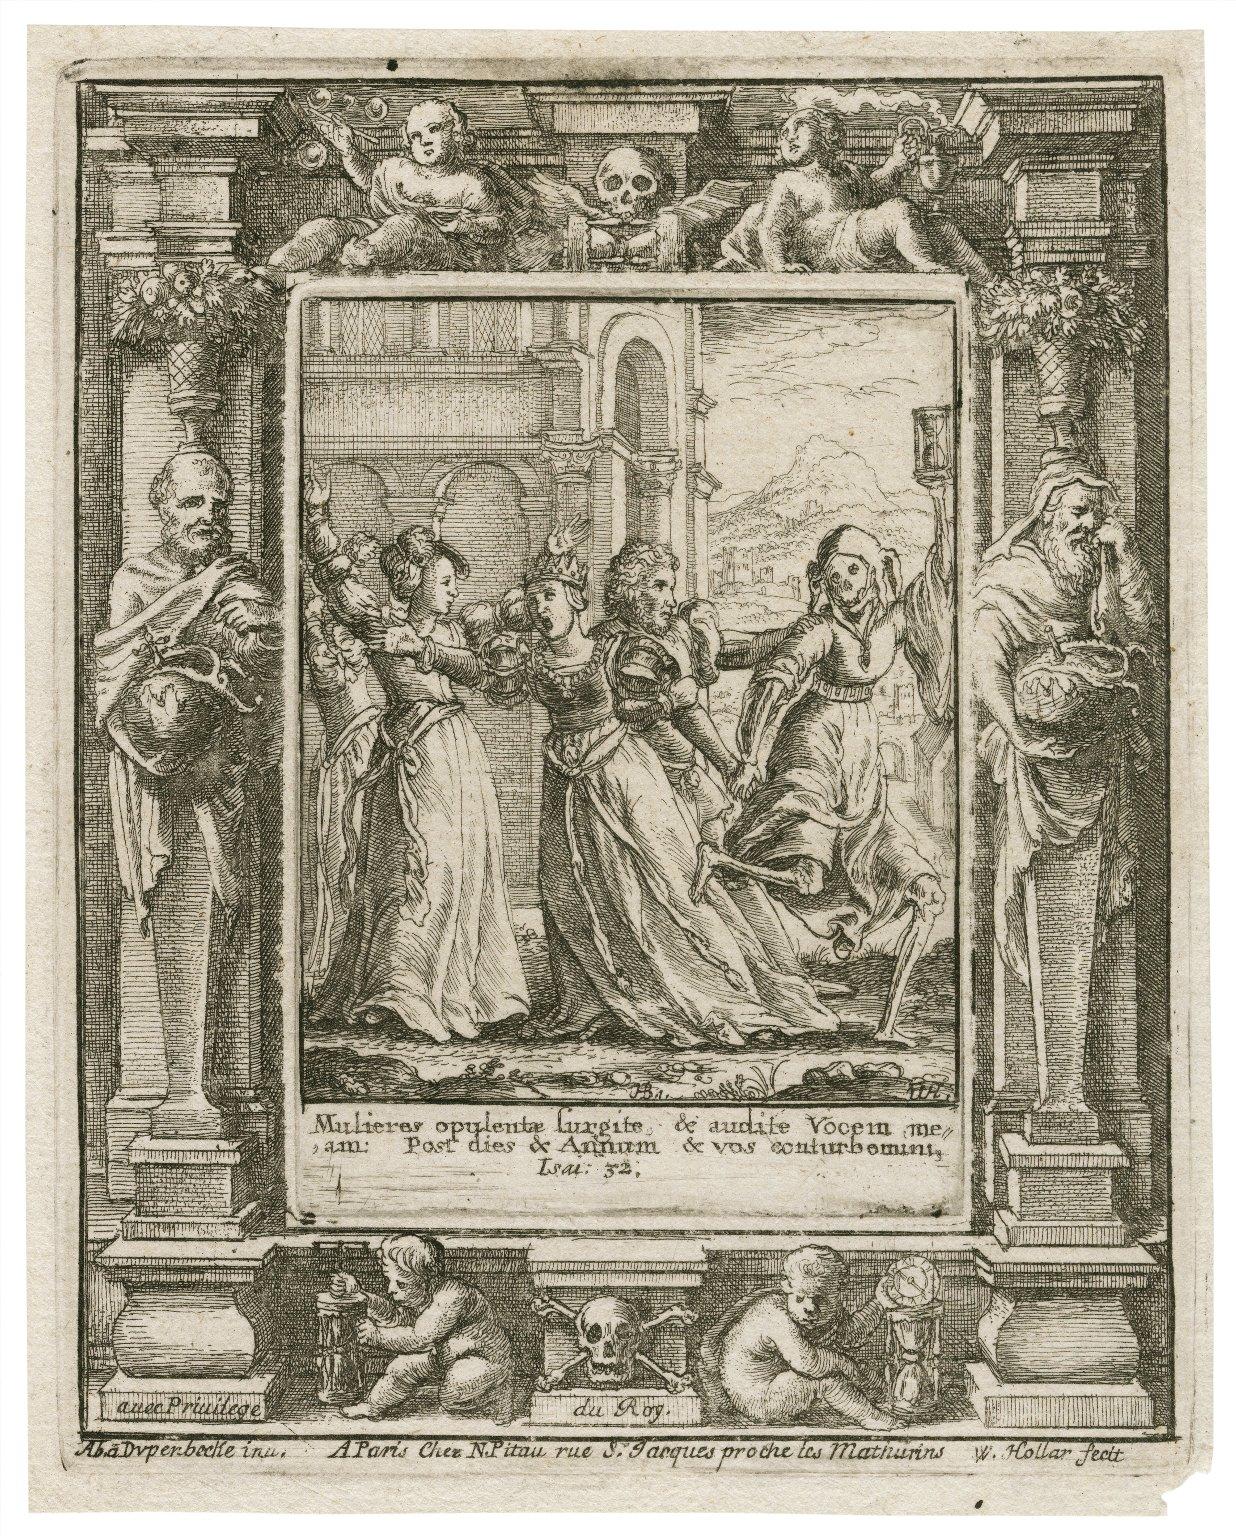 Mulieres opulentae surgite, & audite vocem meam, post dies & annum & vos conturbemini, Isai. 32 [graphic] / H.B. i. [center plate] ; W.H. [center plate] ; Ab. à Dvpenbeché inu. [border] ; W. Hollar fecit [border].